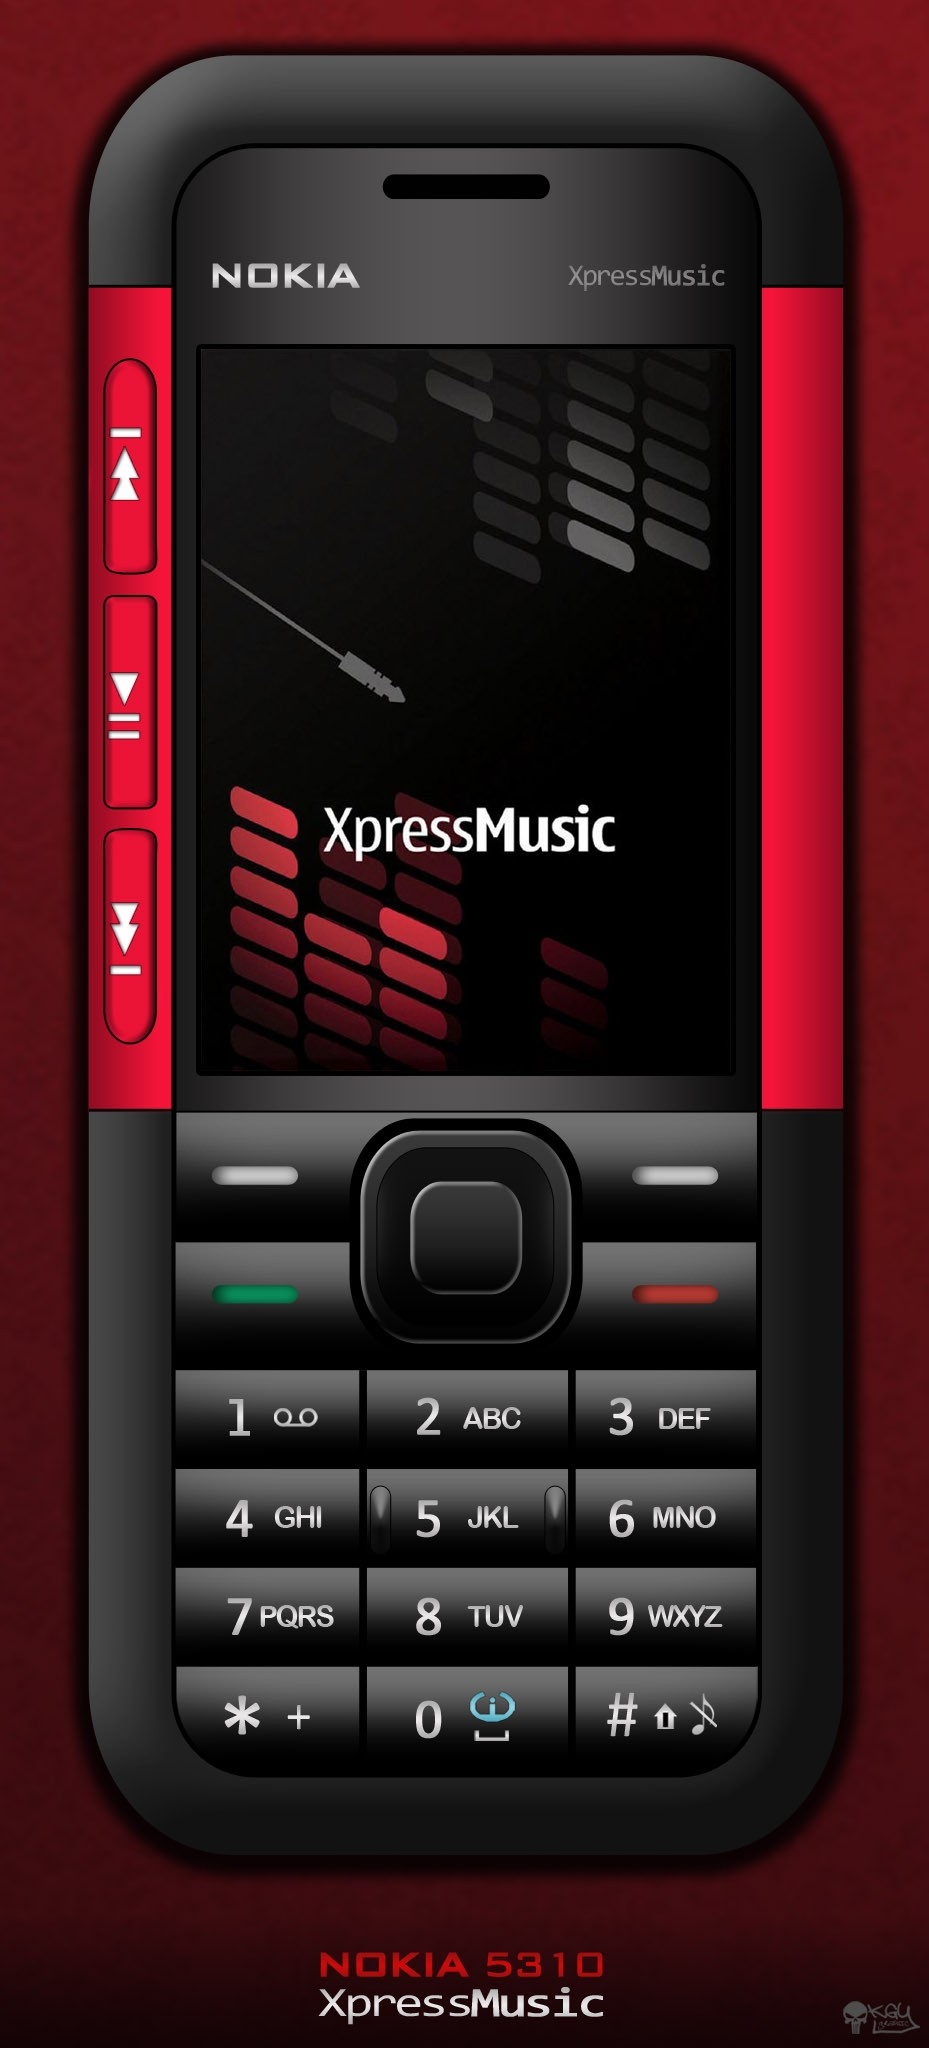 Download aplikasi whatsapp nokia 6600 slide